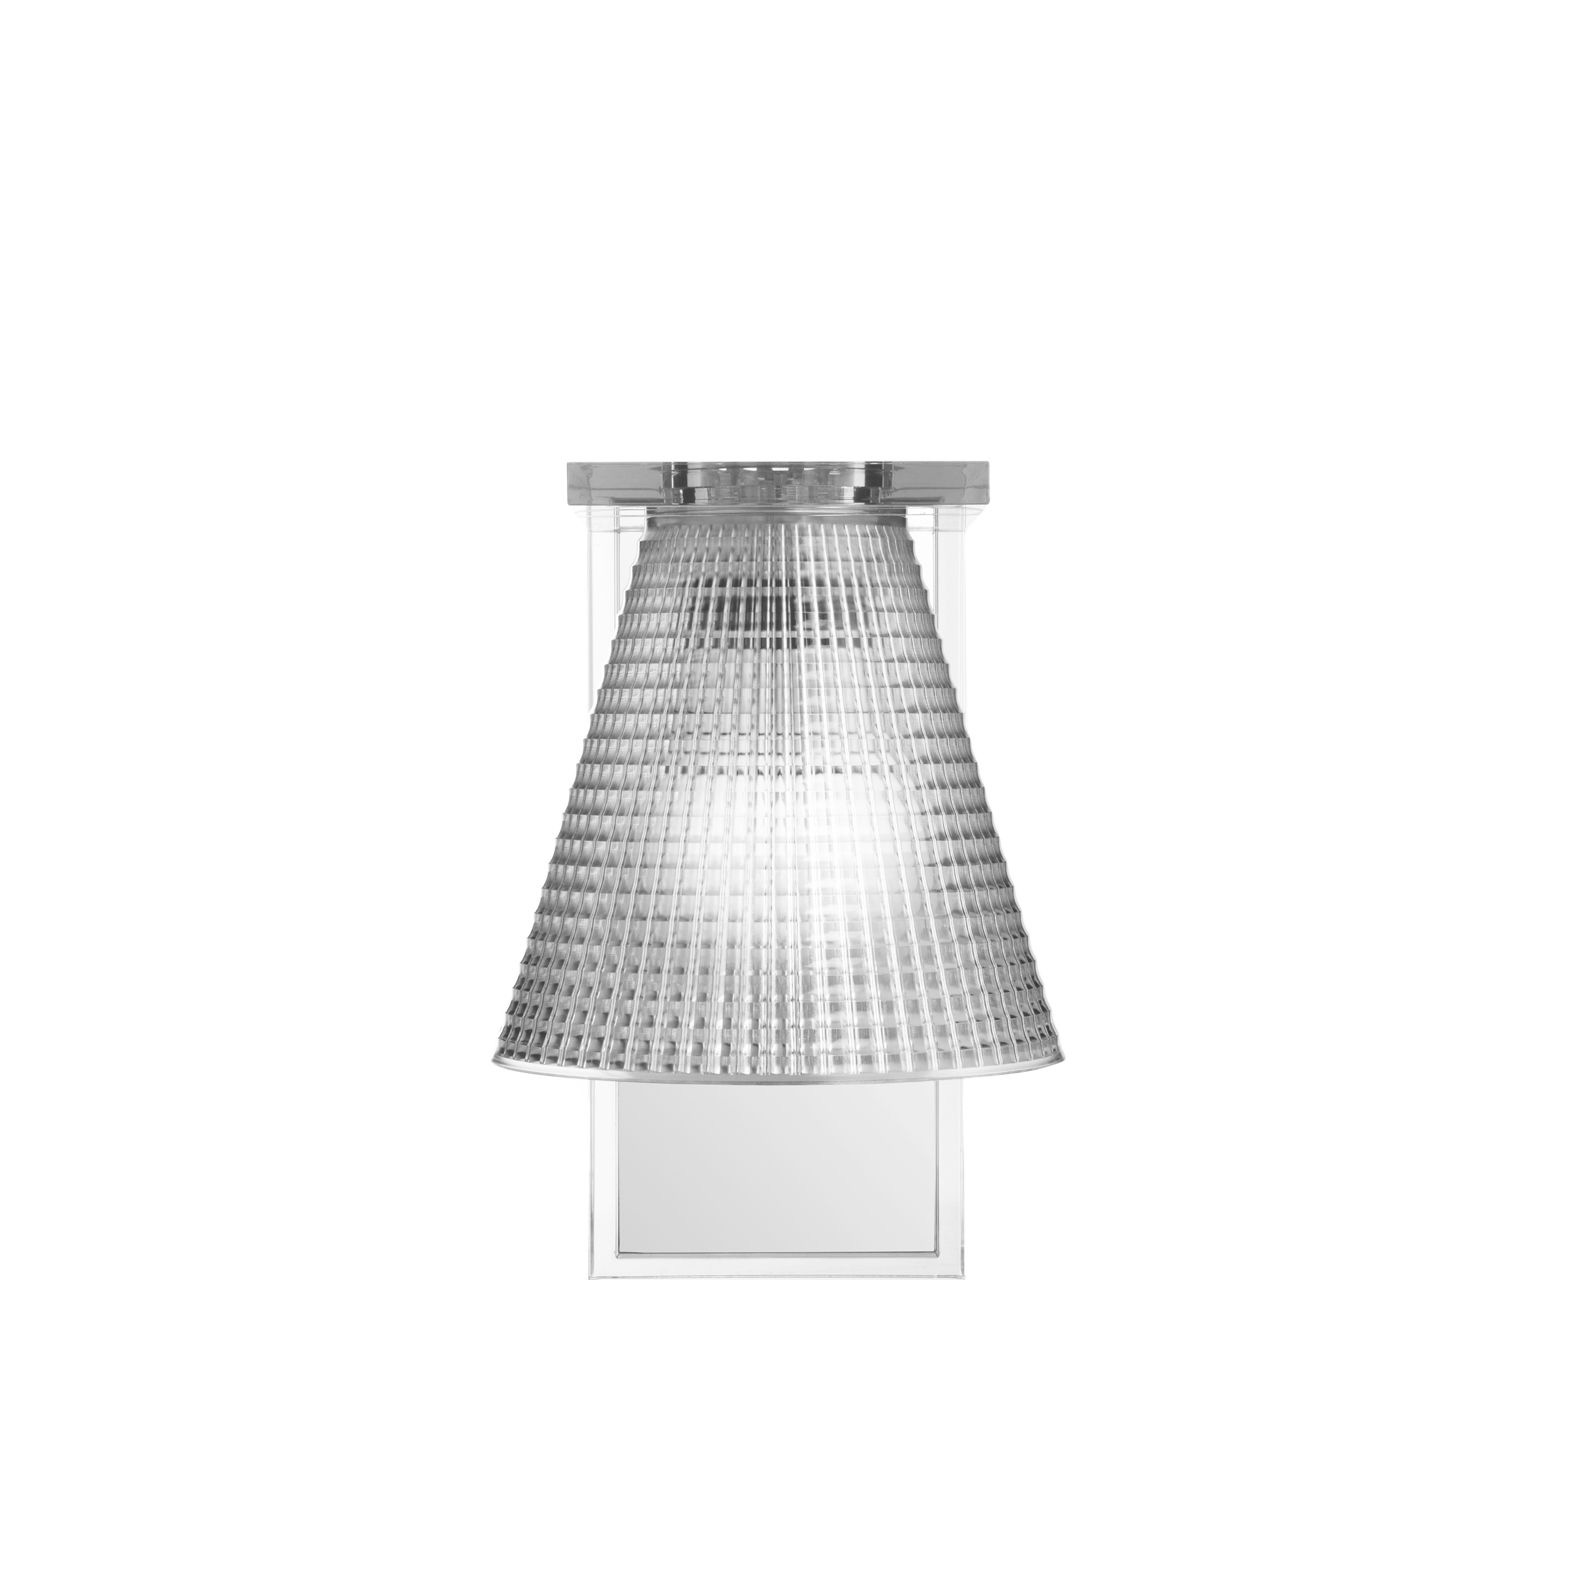 Kartell light air sculptured wall lamp designed by eugeni quitllet aloadofball Images